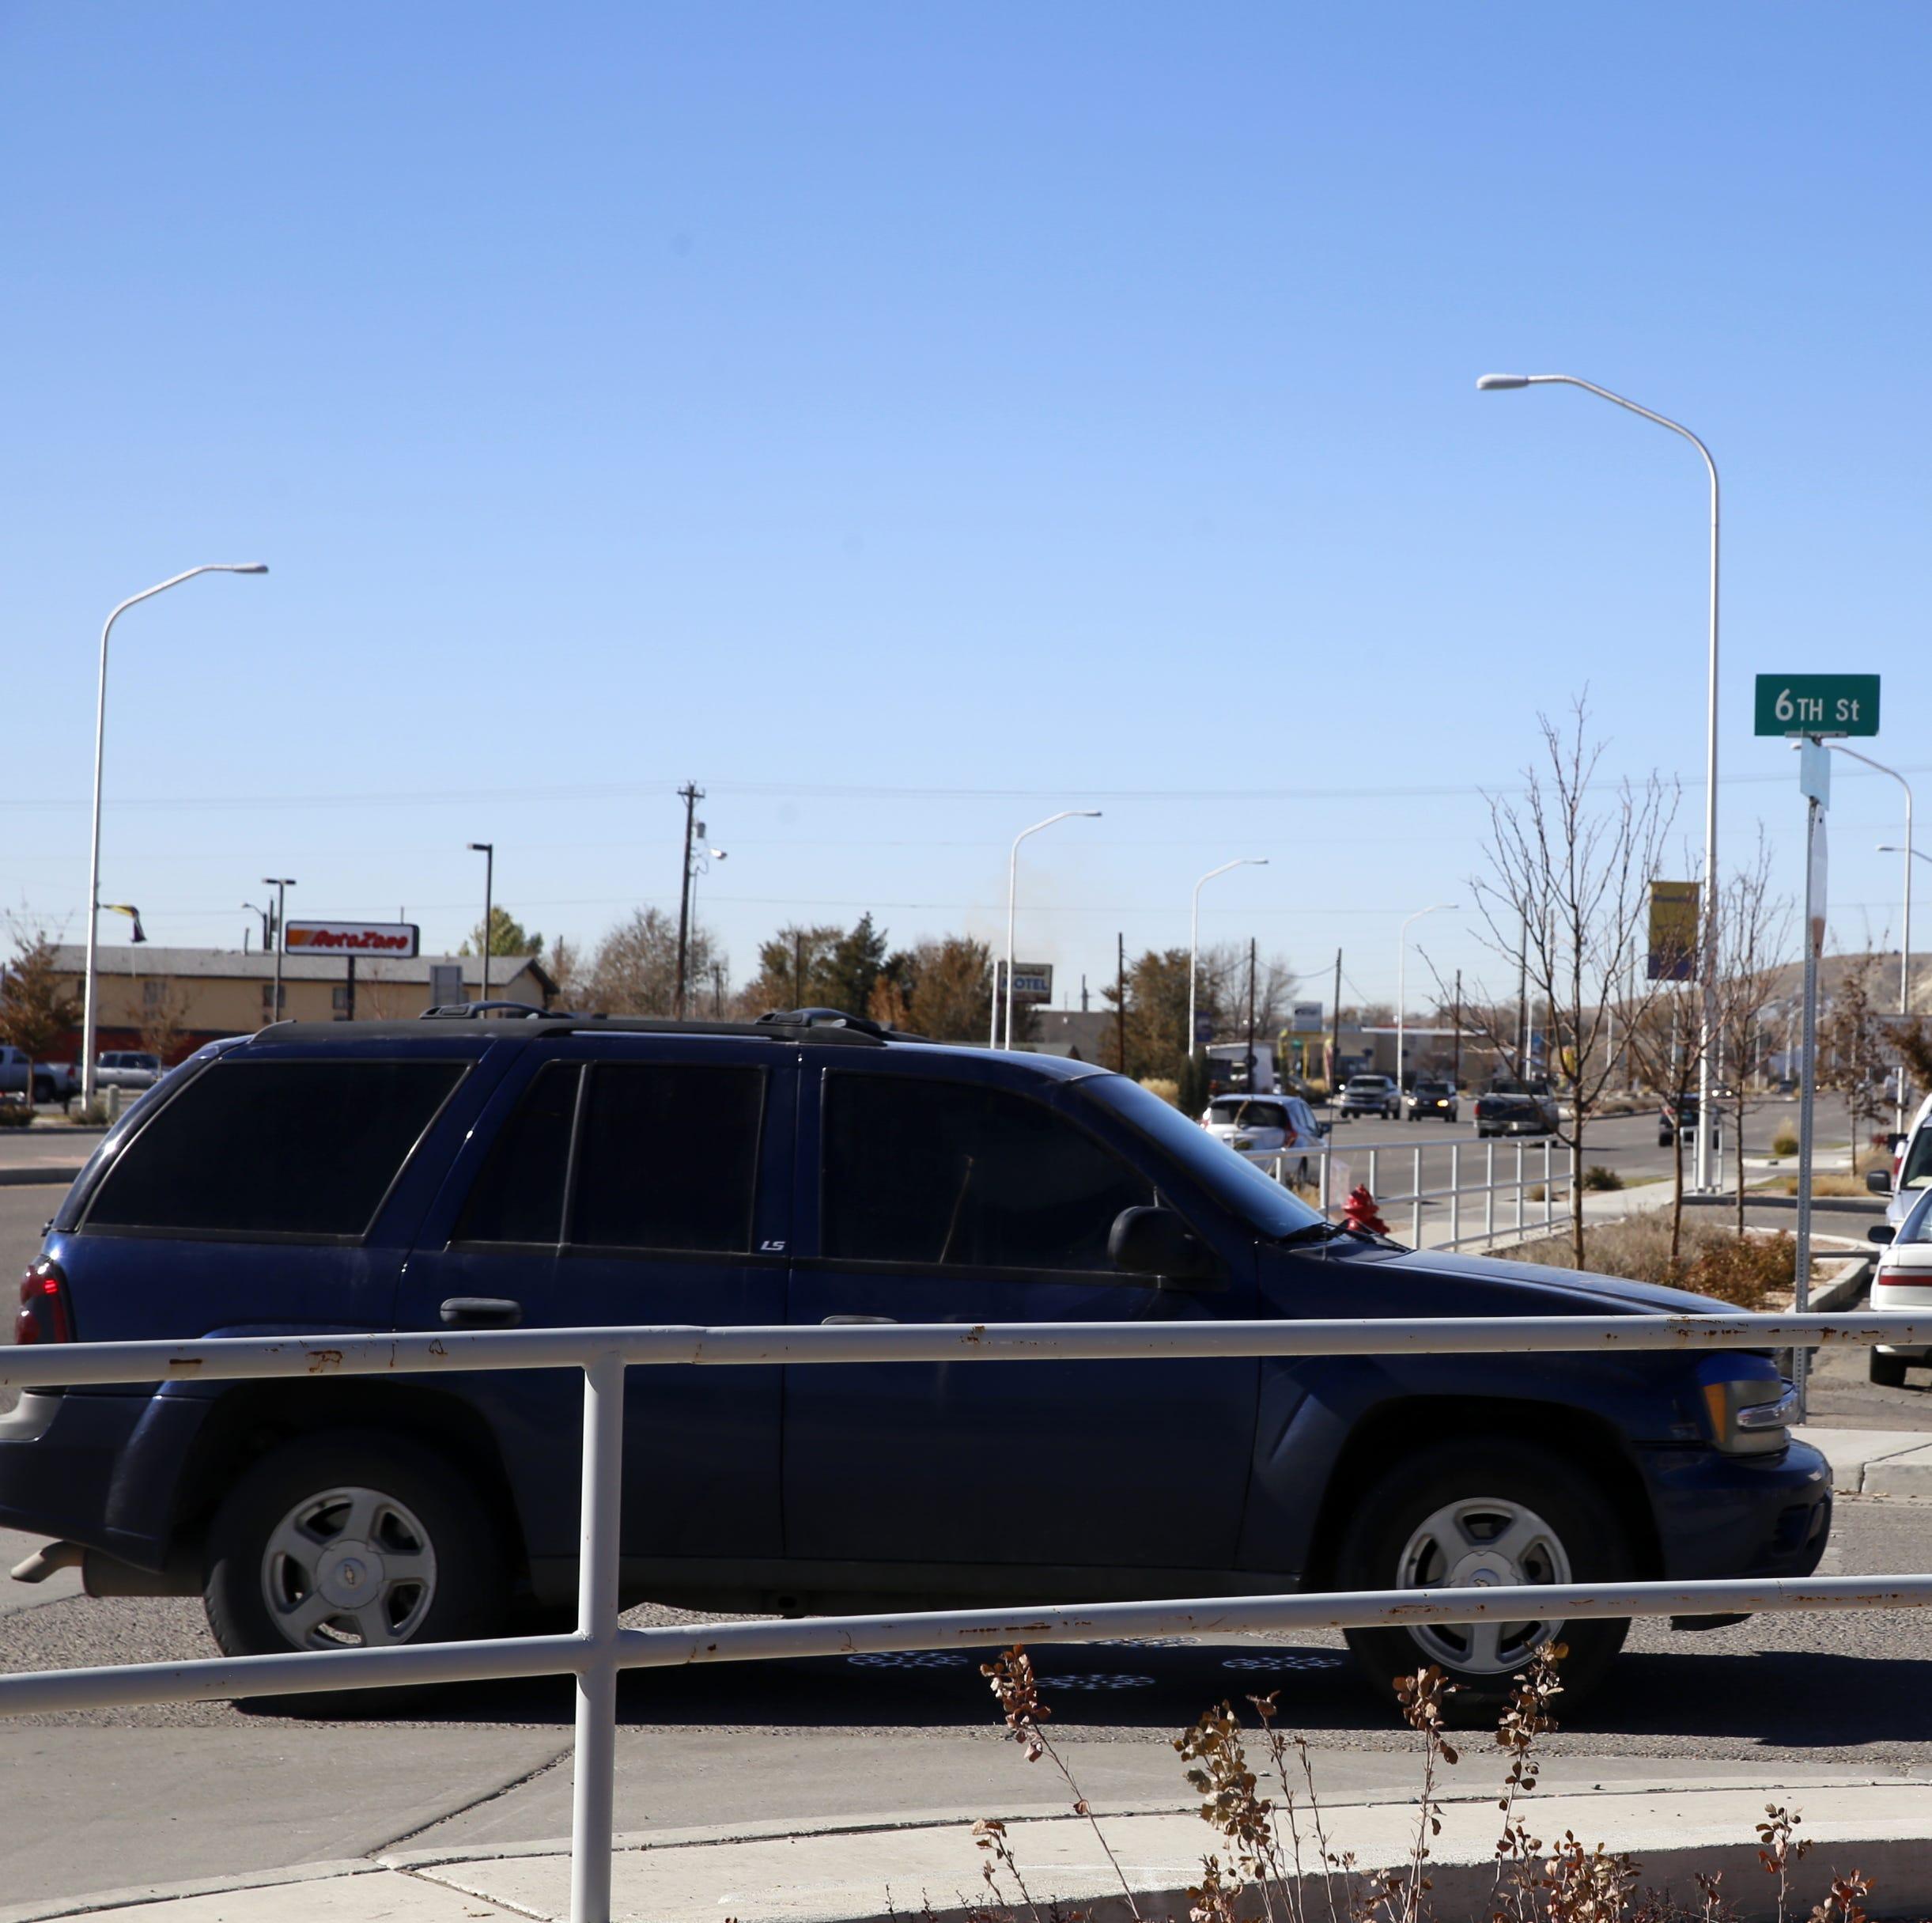 A car turns onto 6th Street, Thursday, Nov. 15, 2018, in Bloomfield.